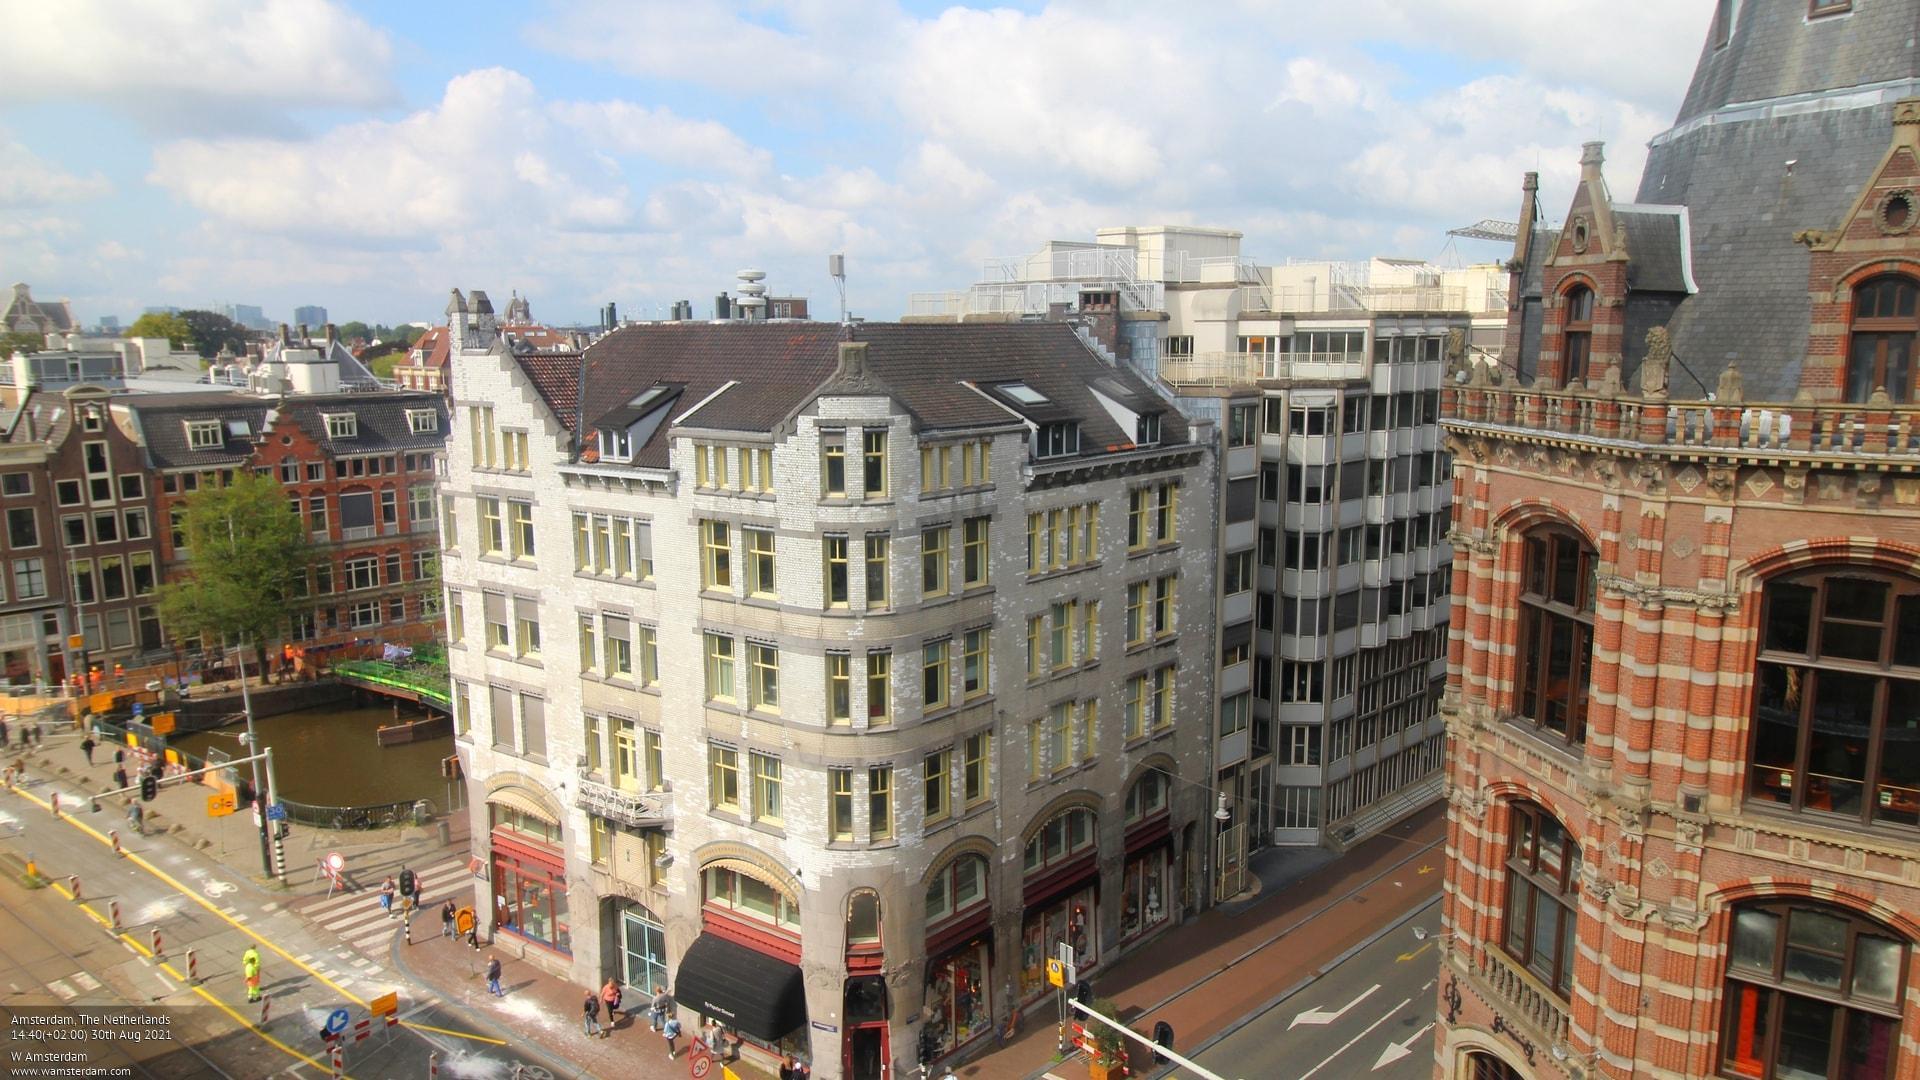 Webkamera Amsterdam: Settentrionale − W